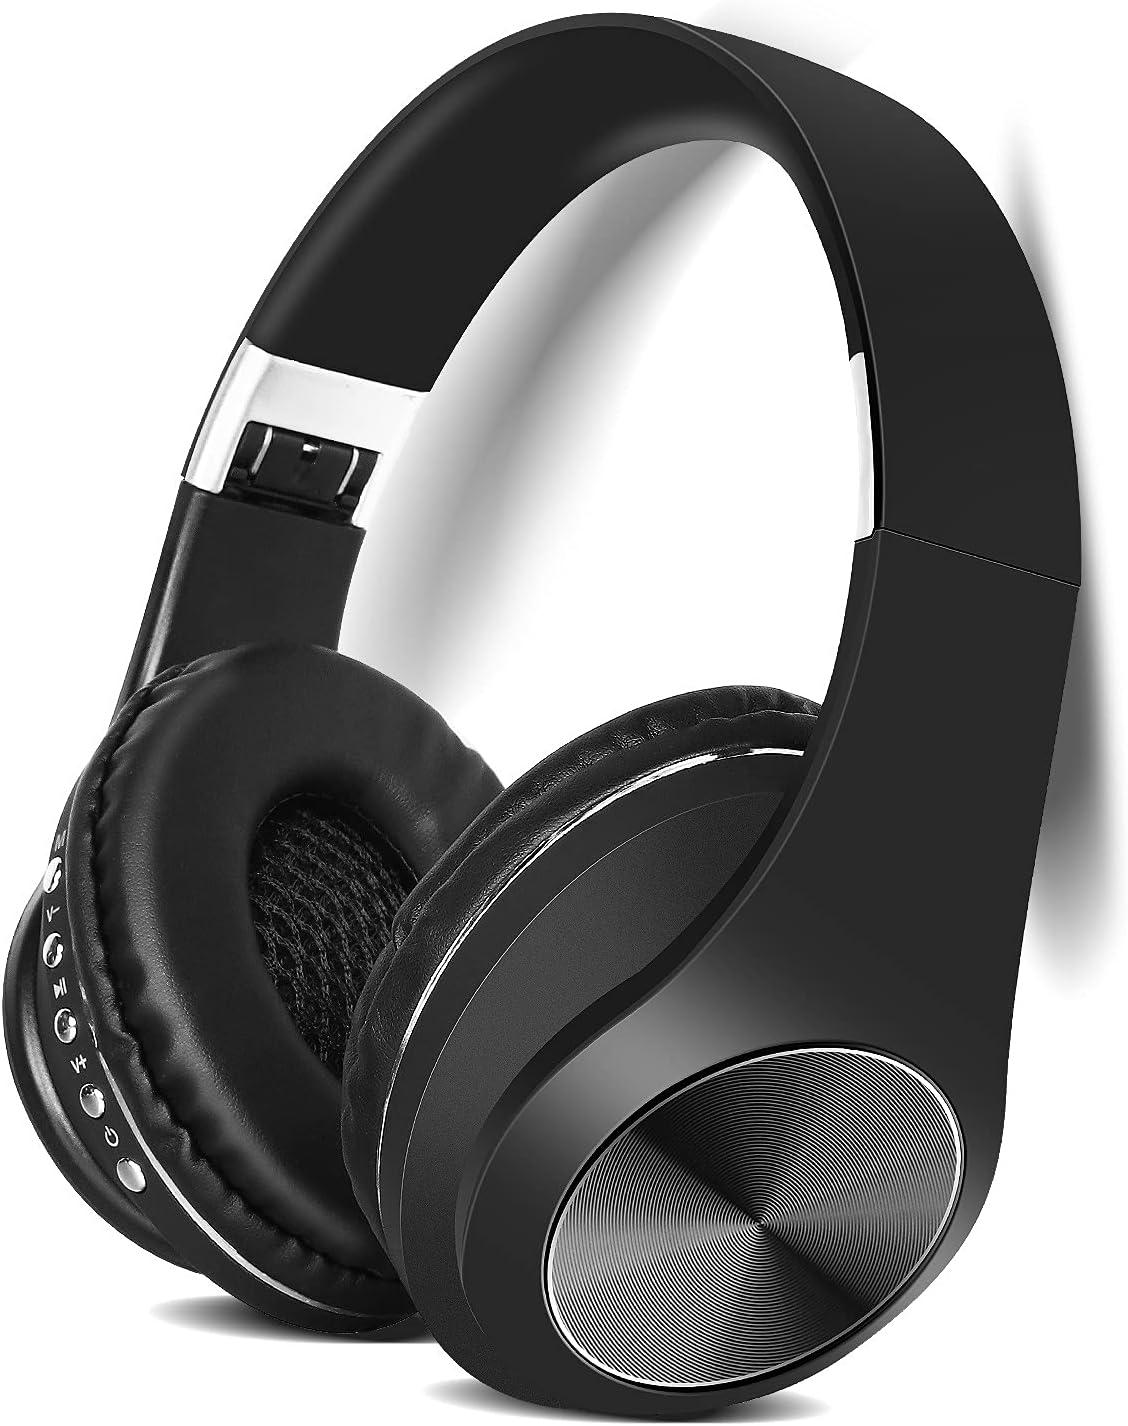 UrbanX UX991 unisex Wireless Miami Mall Industry with Headphones Overhead Leading